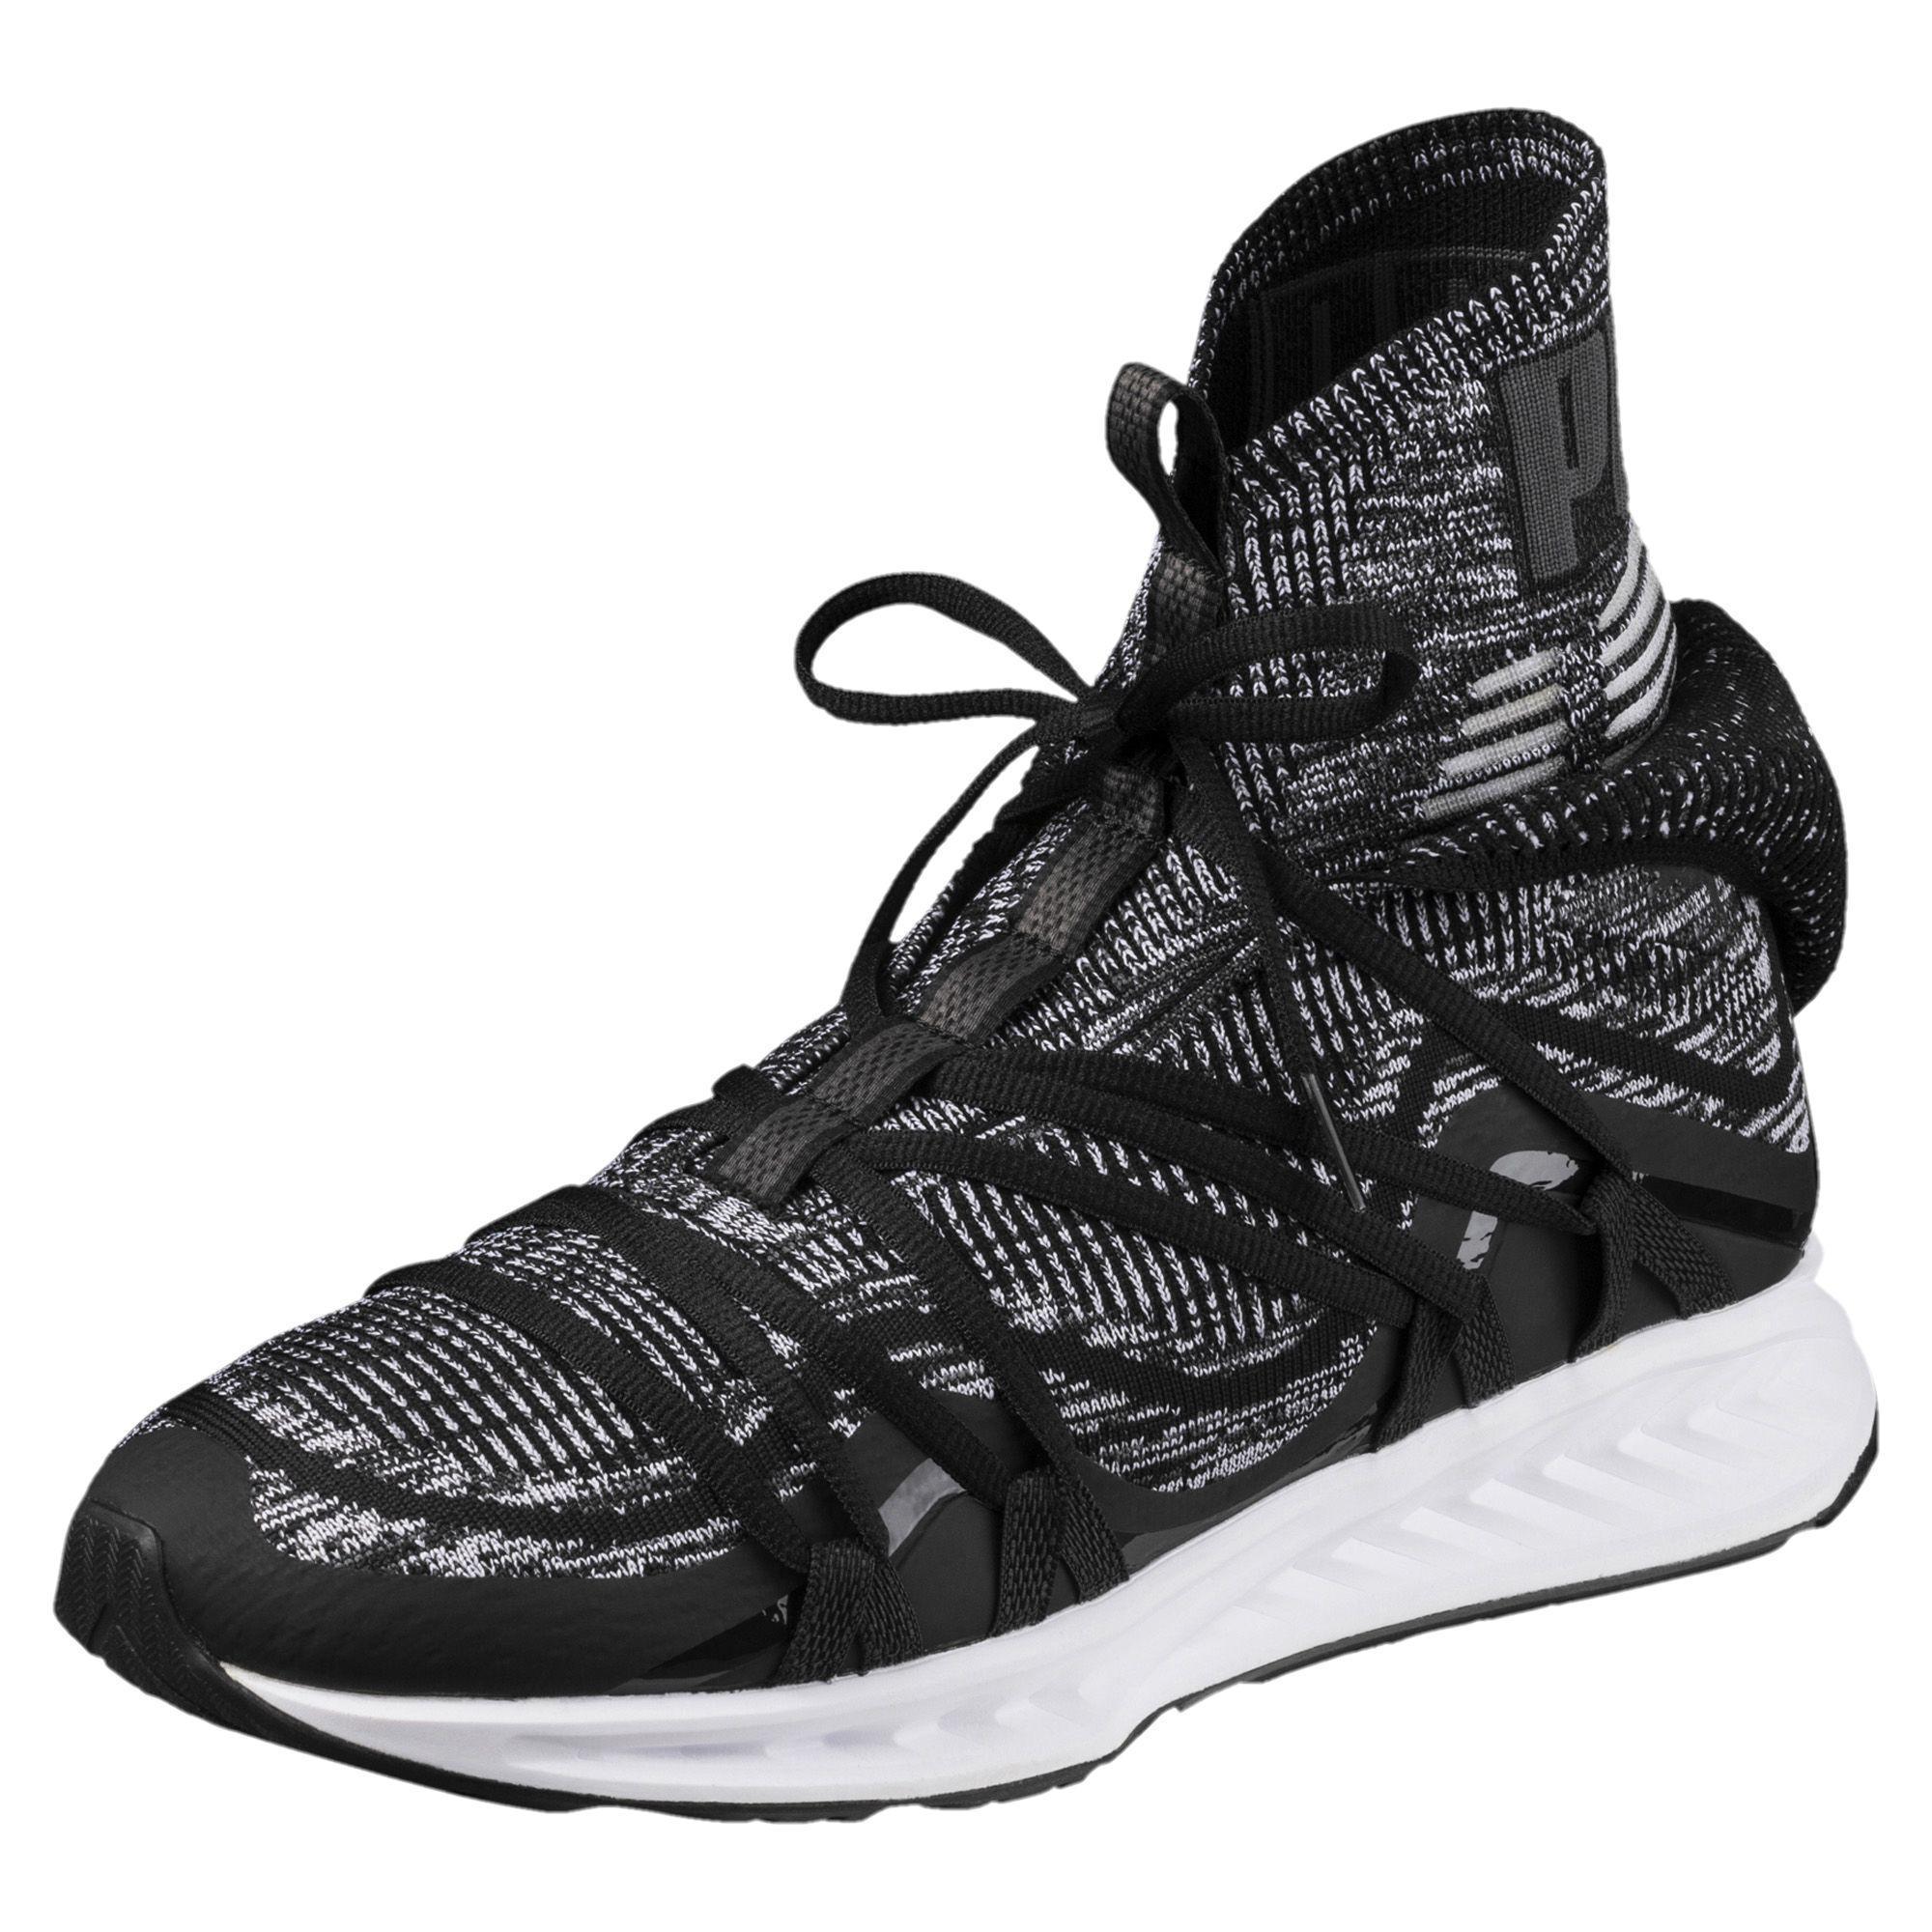 purchase cheap 1fa04 e74b3 Black Ignite Evoknit Fold Men's Training Shoes